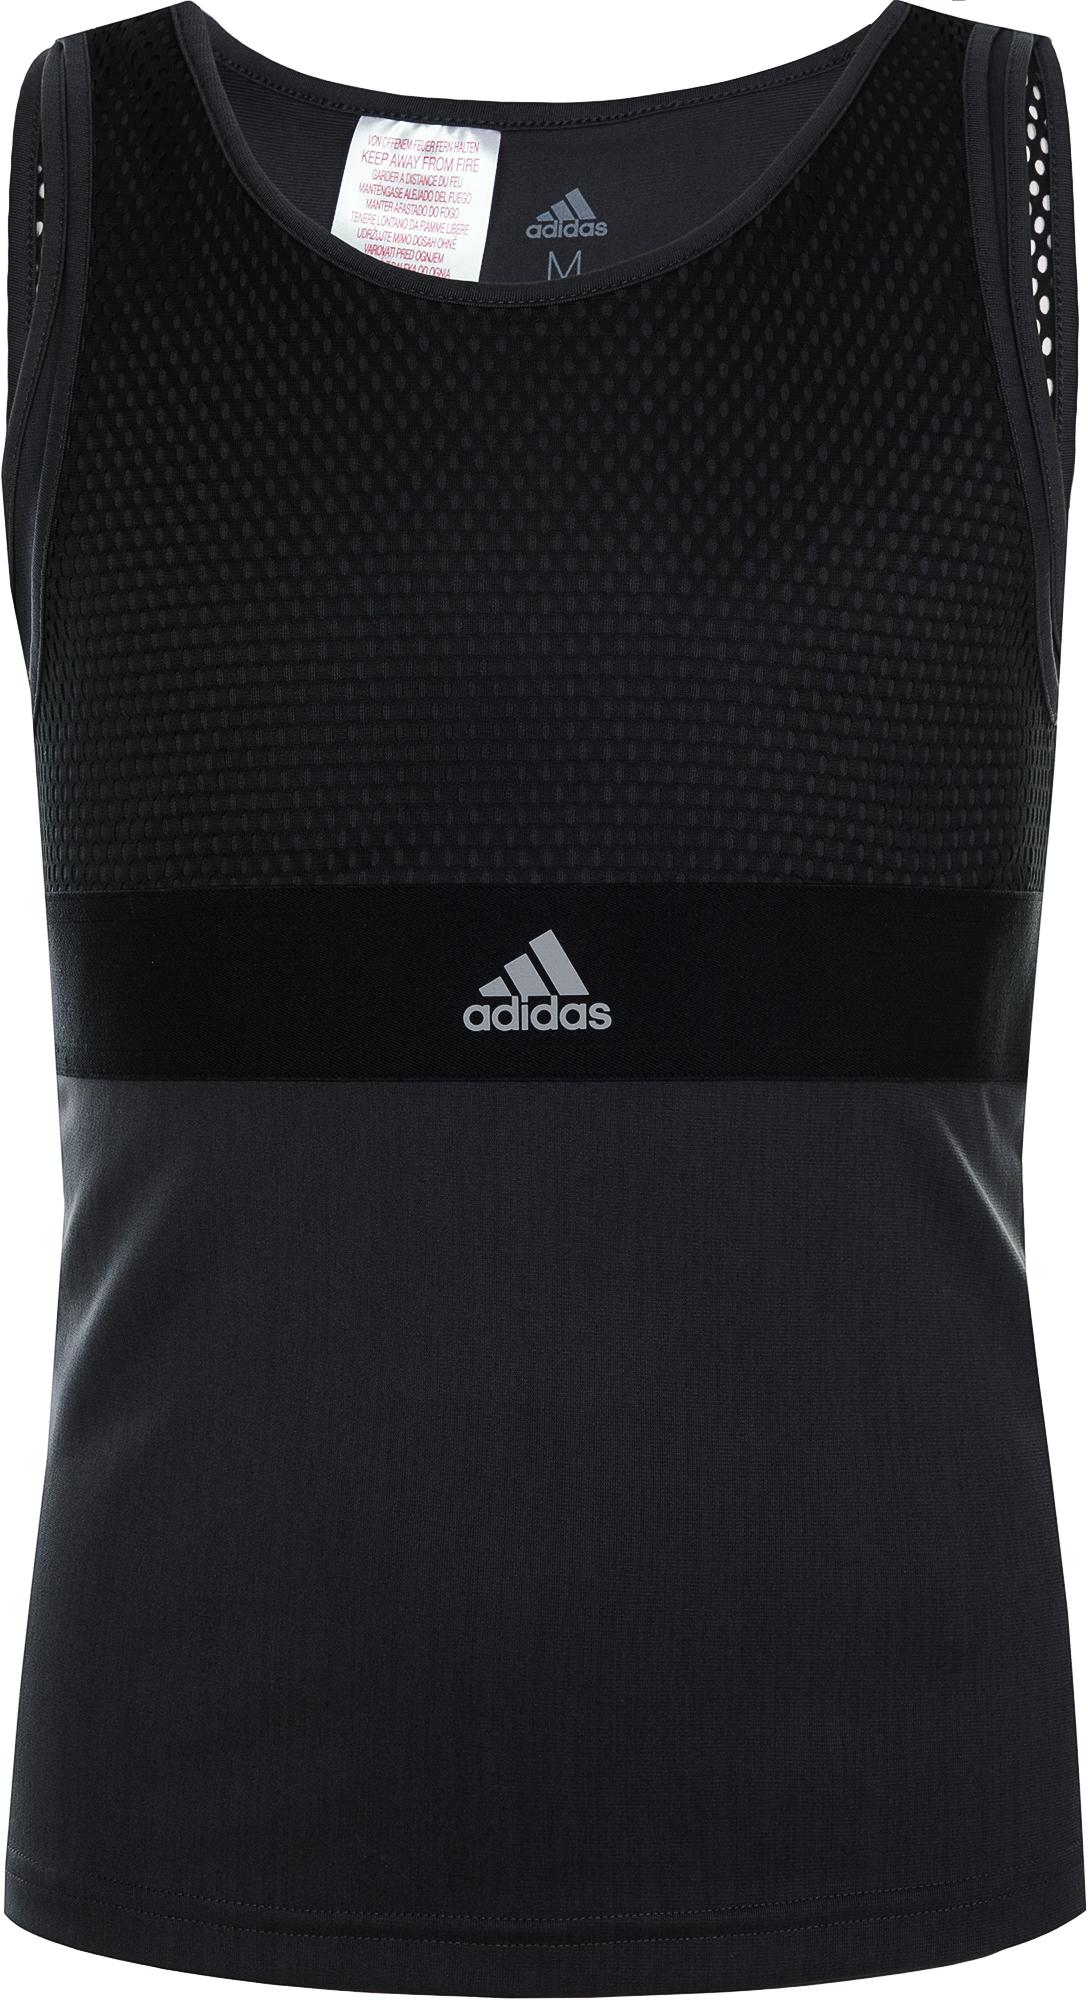 Adidas Майка для девочек Adidas New York, размер 170 цена